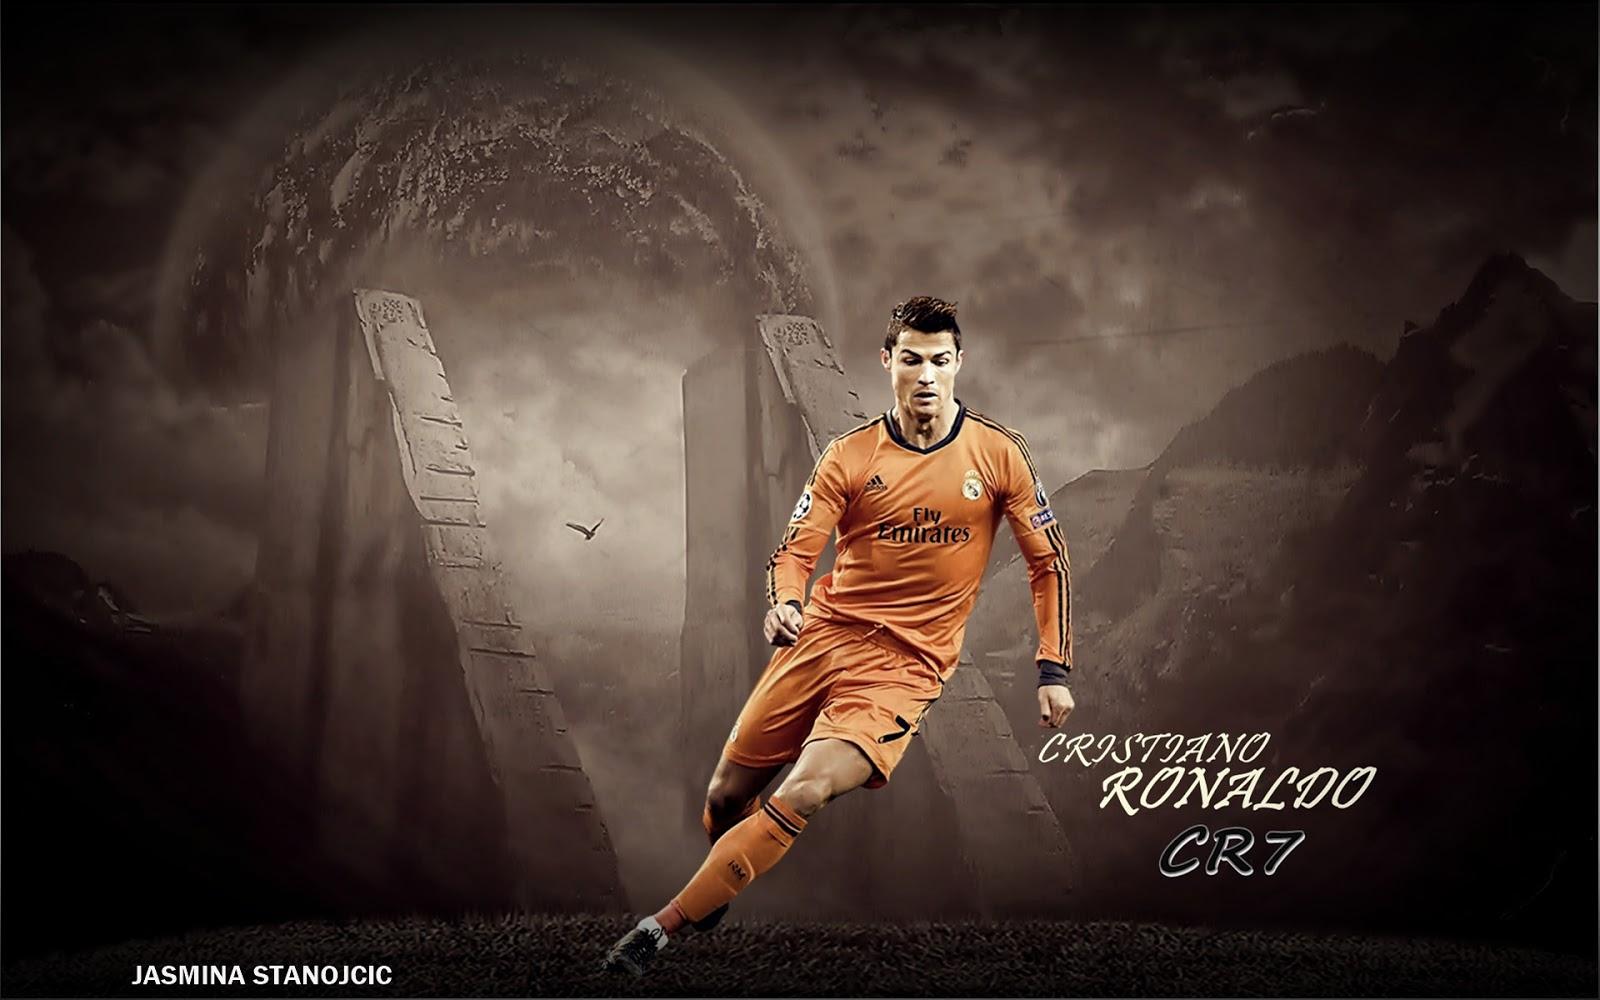 Futbol Unidos: Cristiano Ronaldo Wallpapers 2015, Real